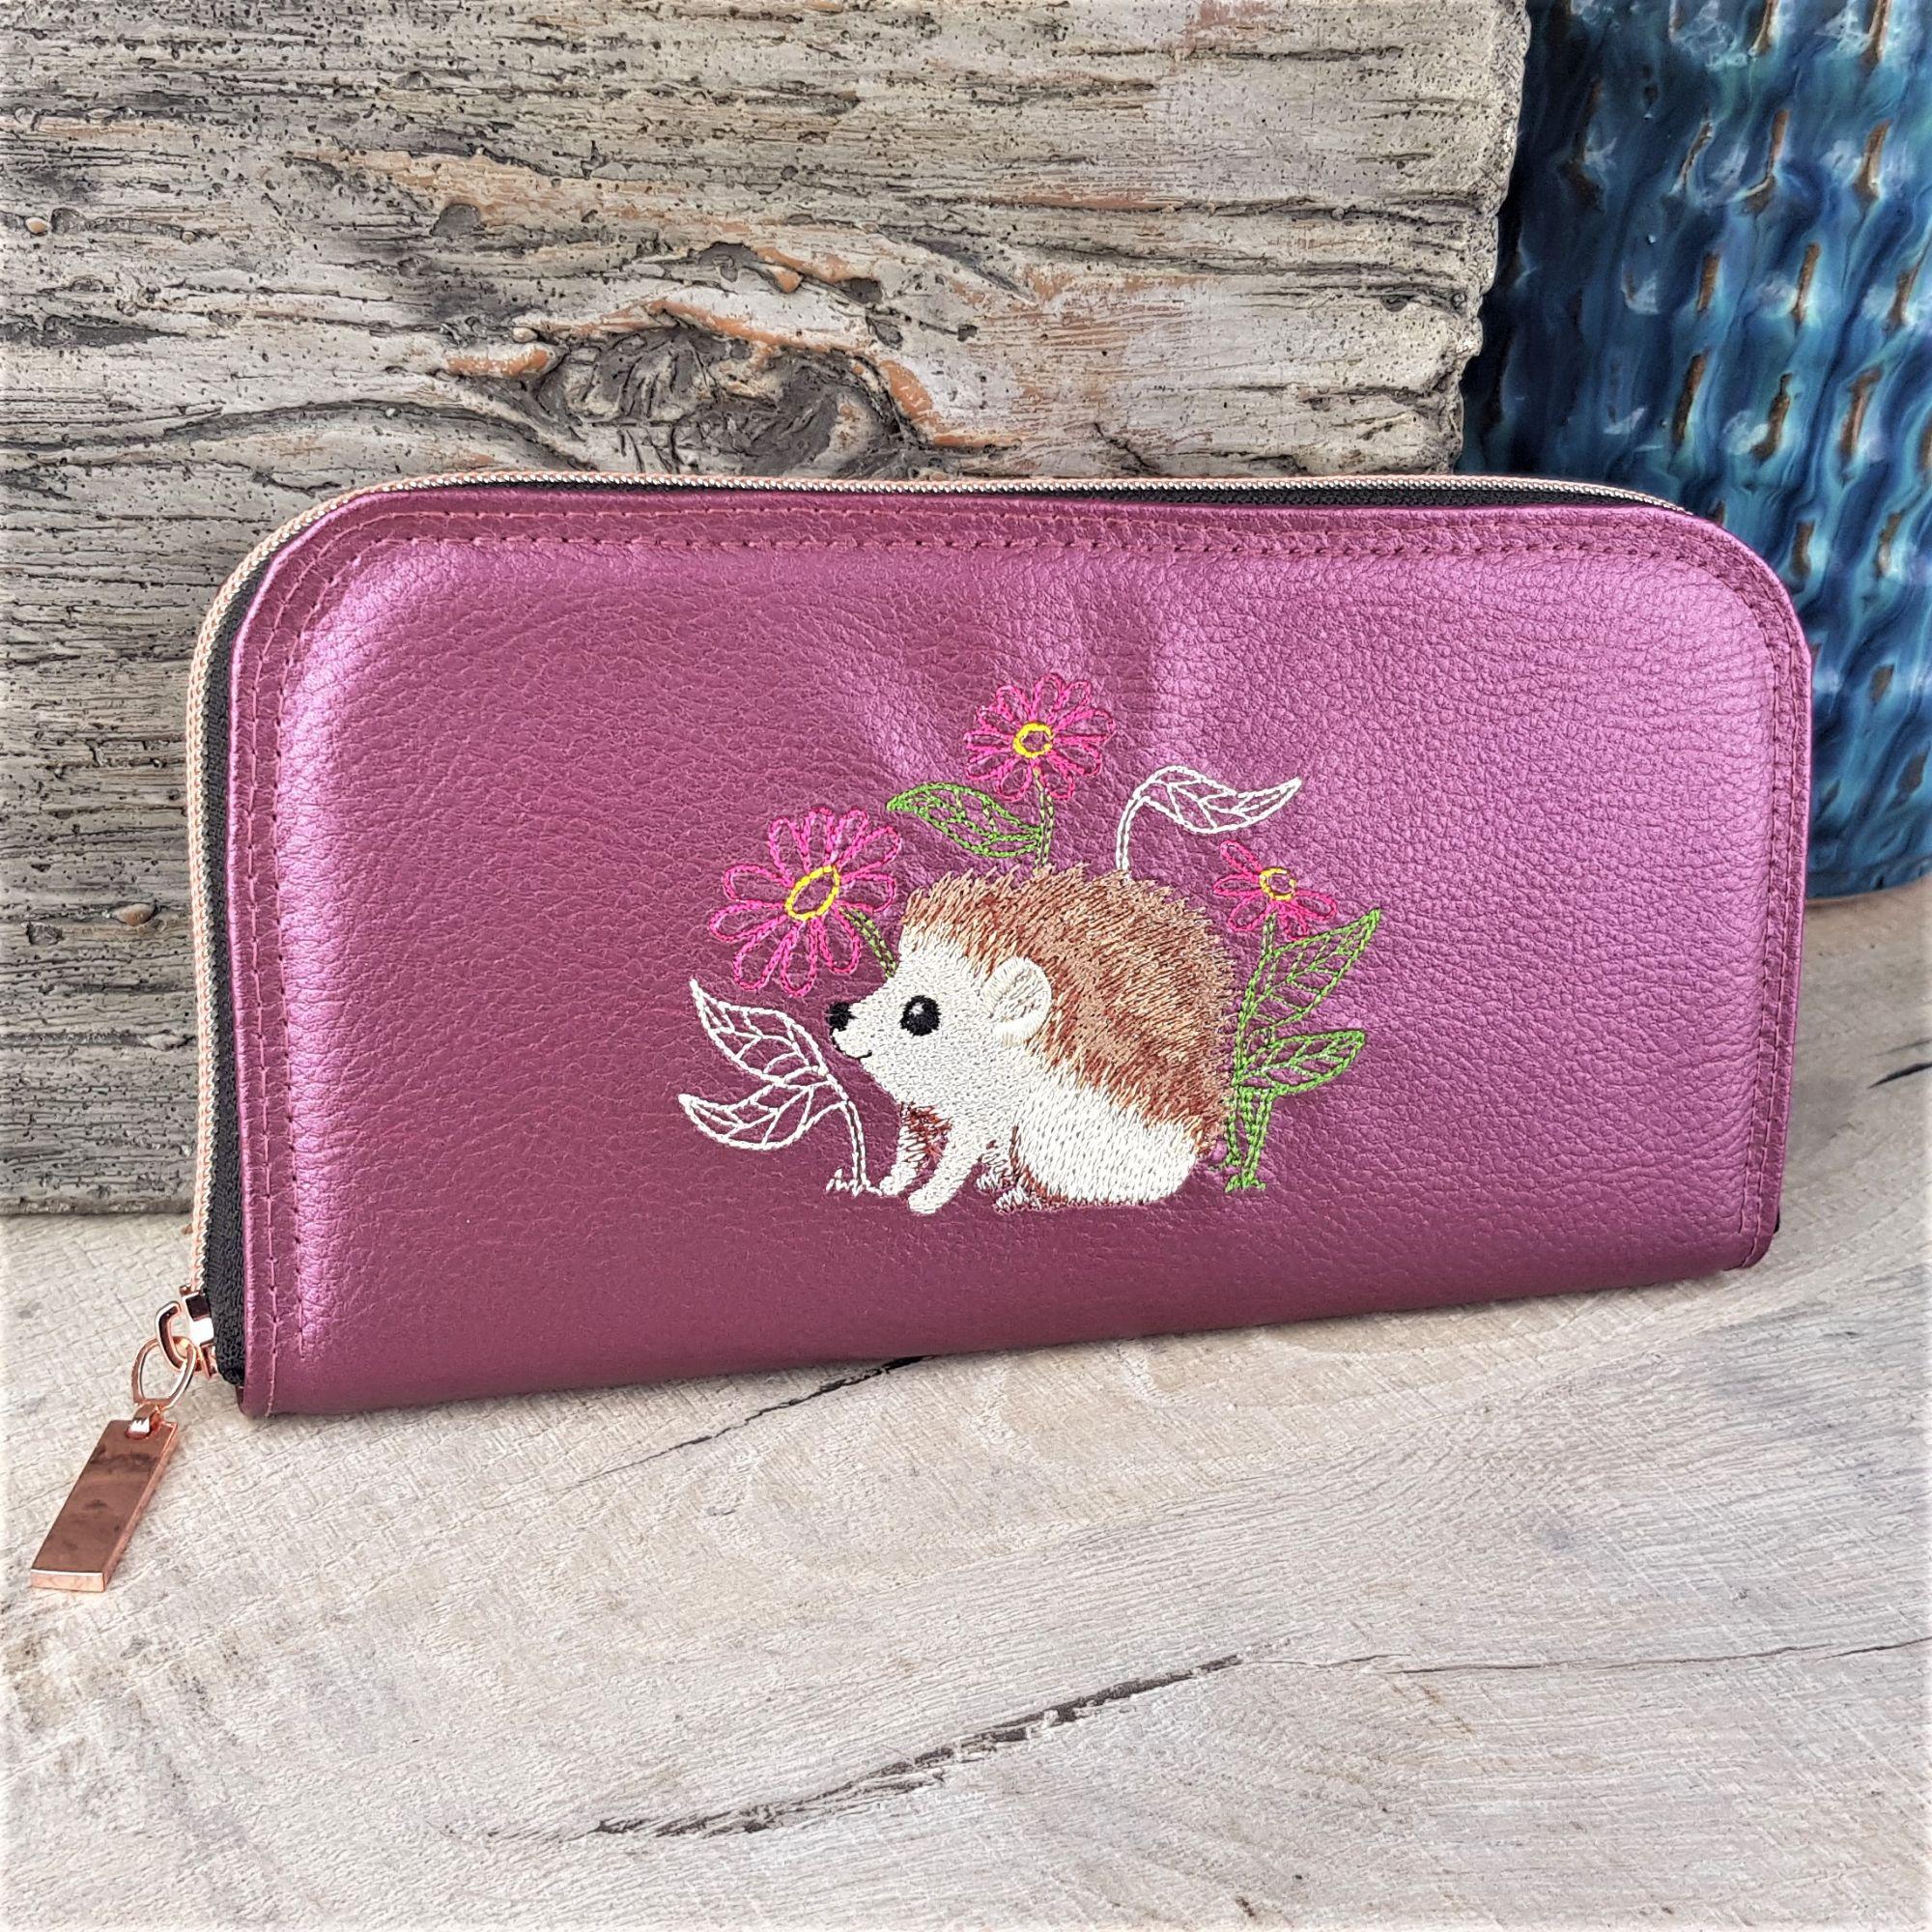 Unique-zip-around-wallet-purse-with-embroidered-hedge-hog